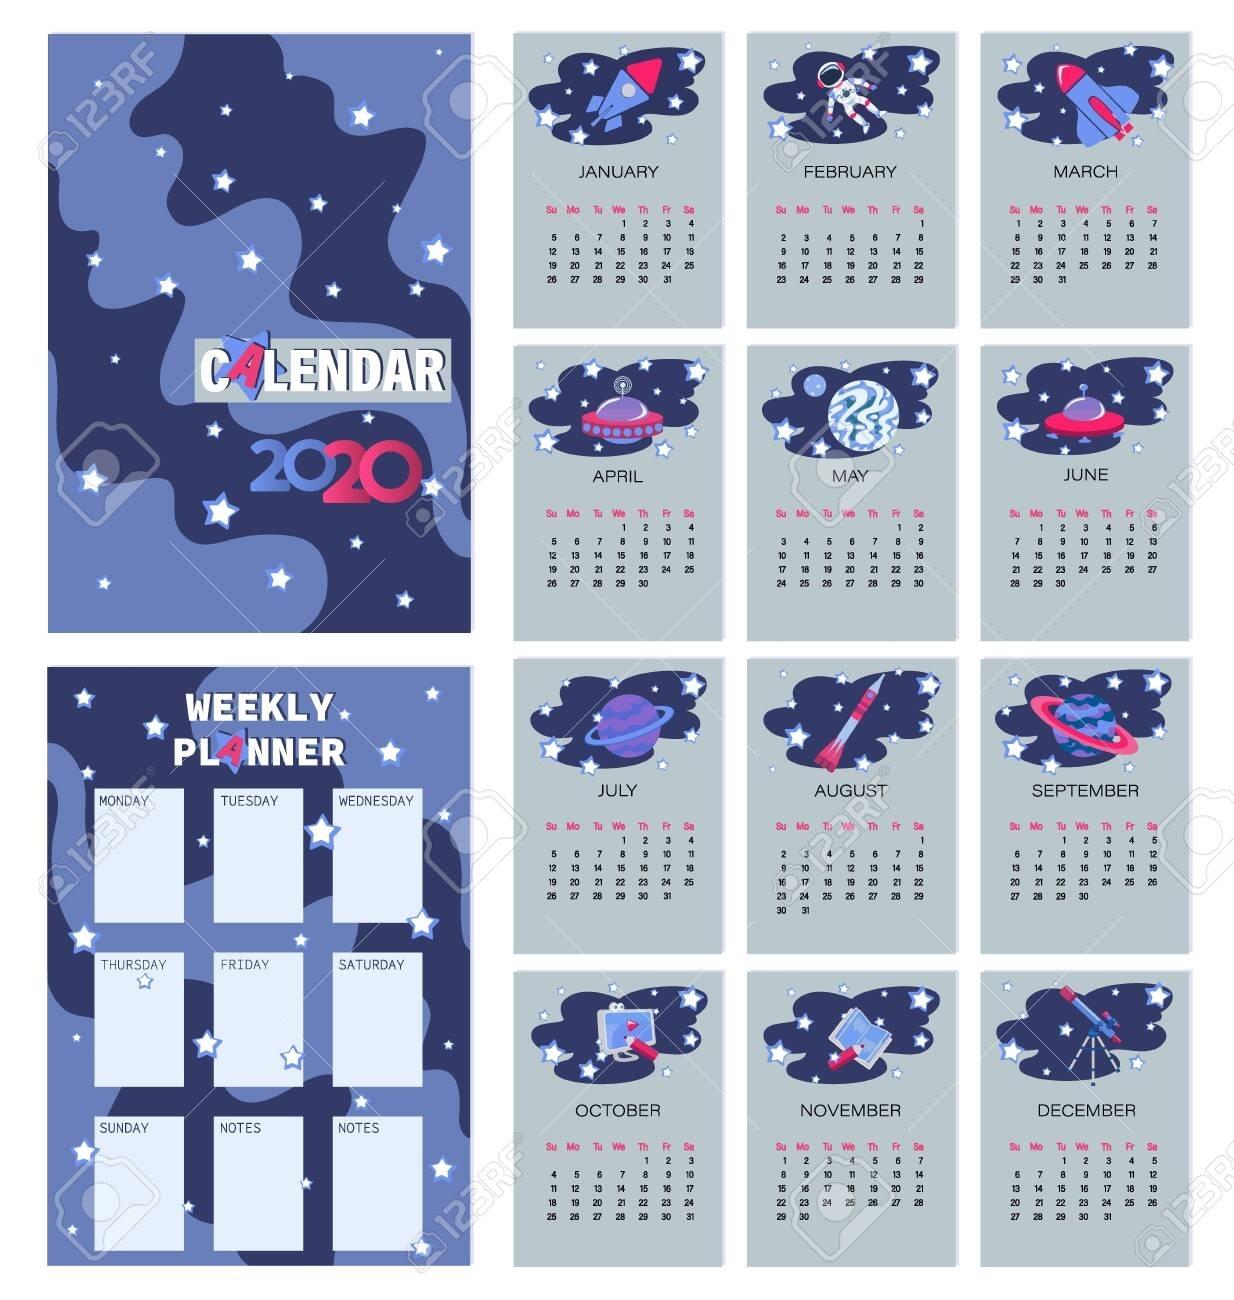 Space. Calendar Planner For 2020. Weekly Planner. The Week Starts..